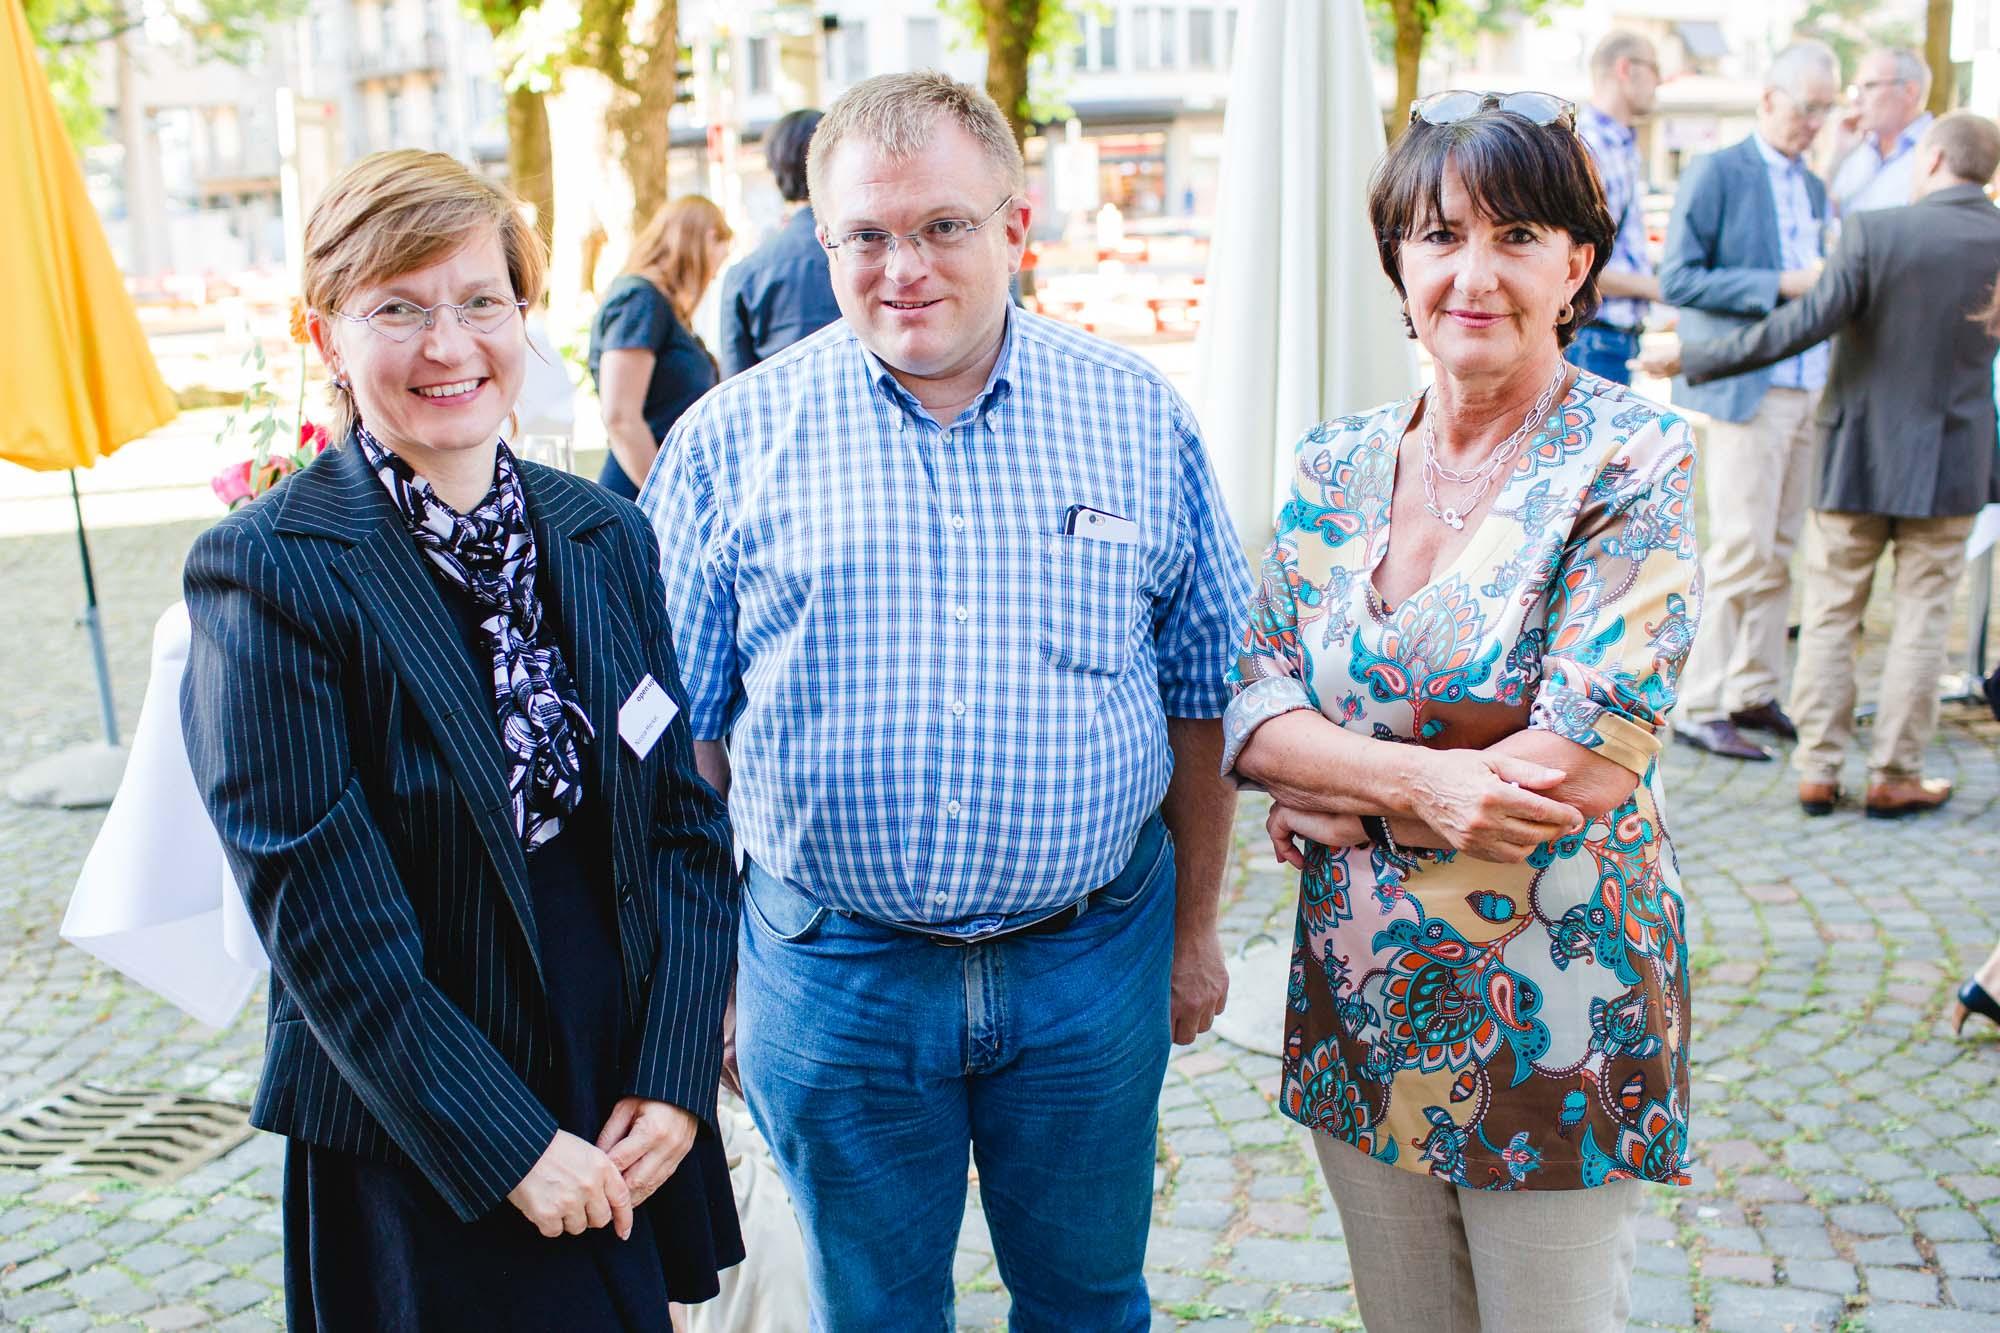 Nicole Merkel, Ralph Beyeler and Stefania Misteli